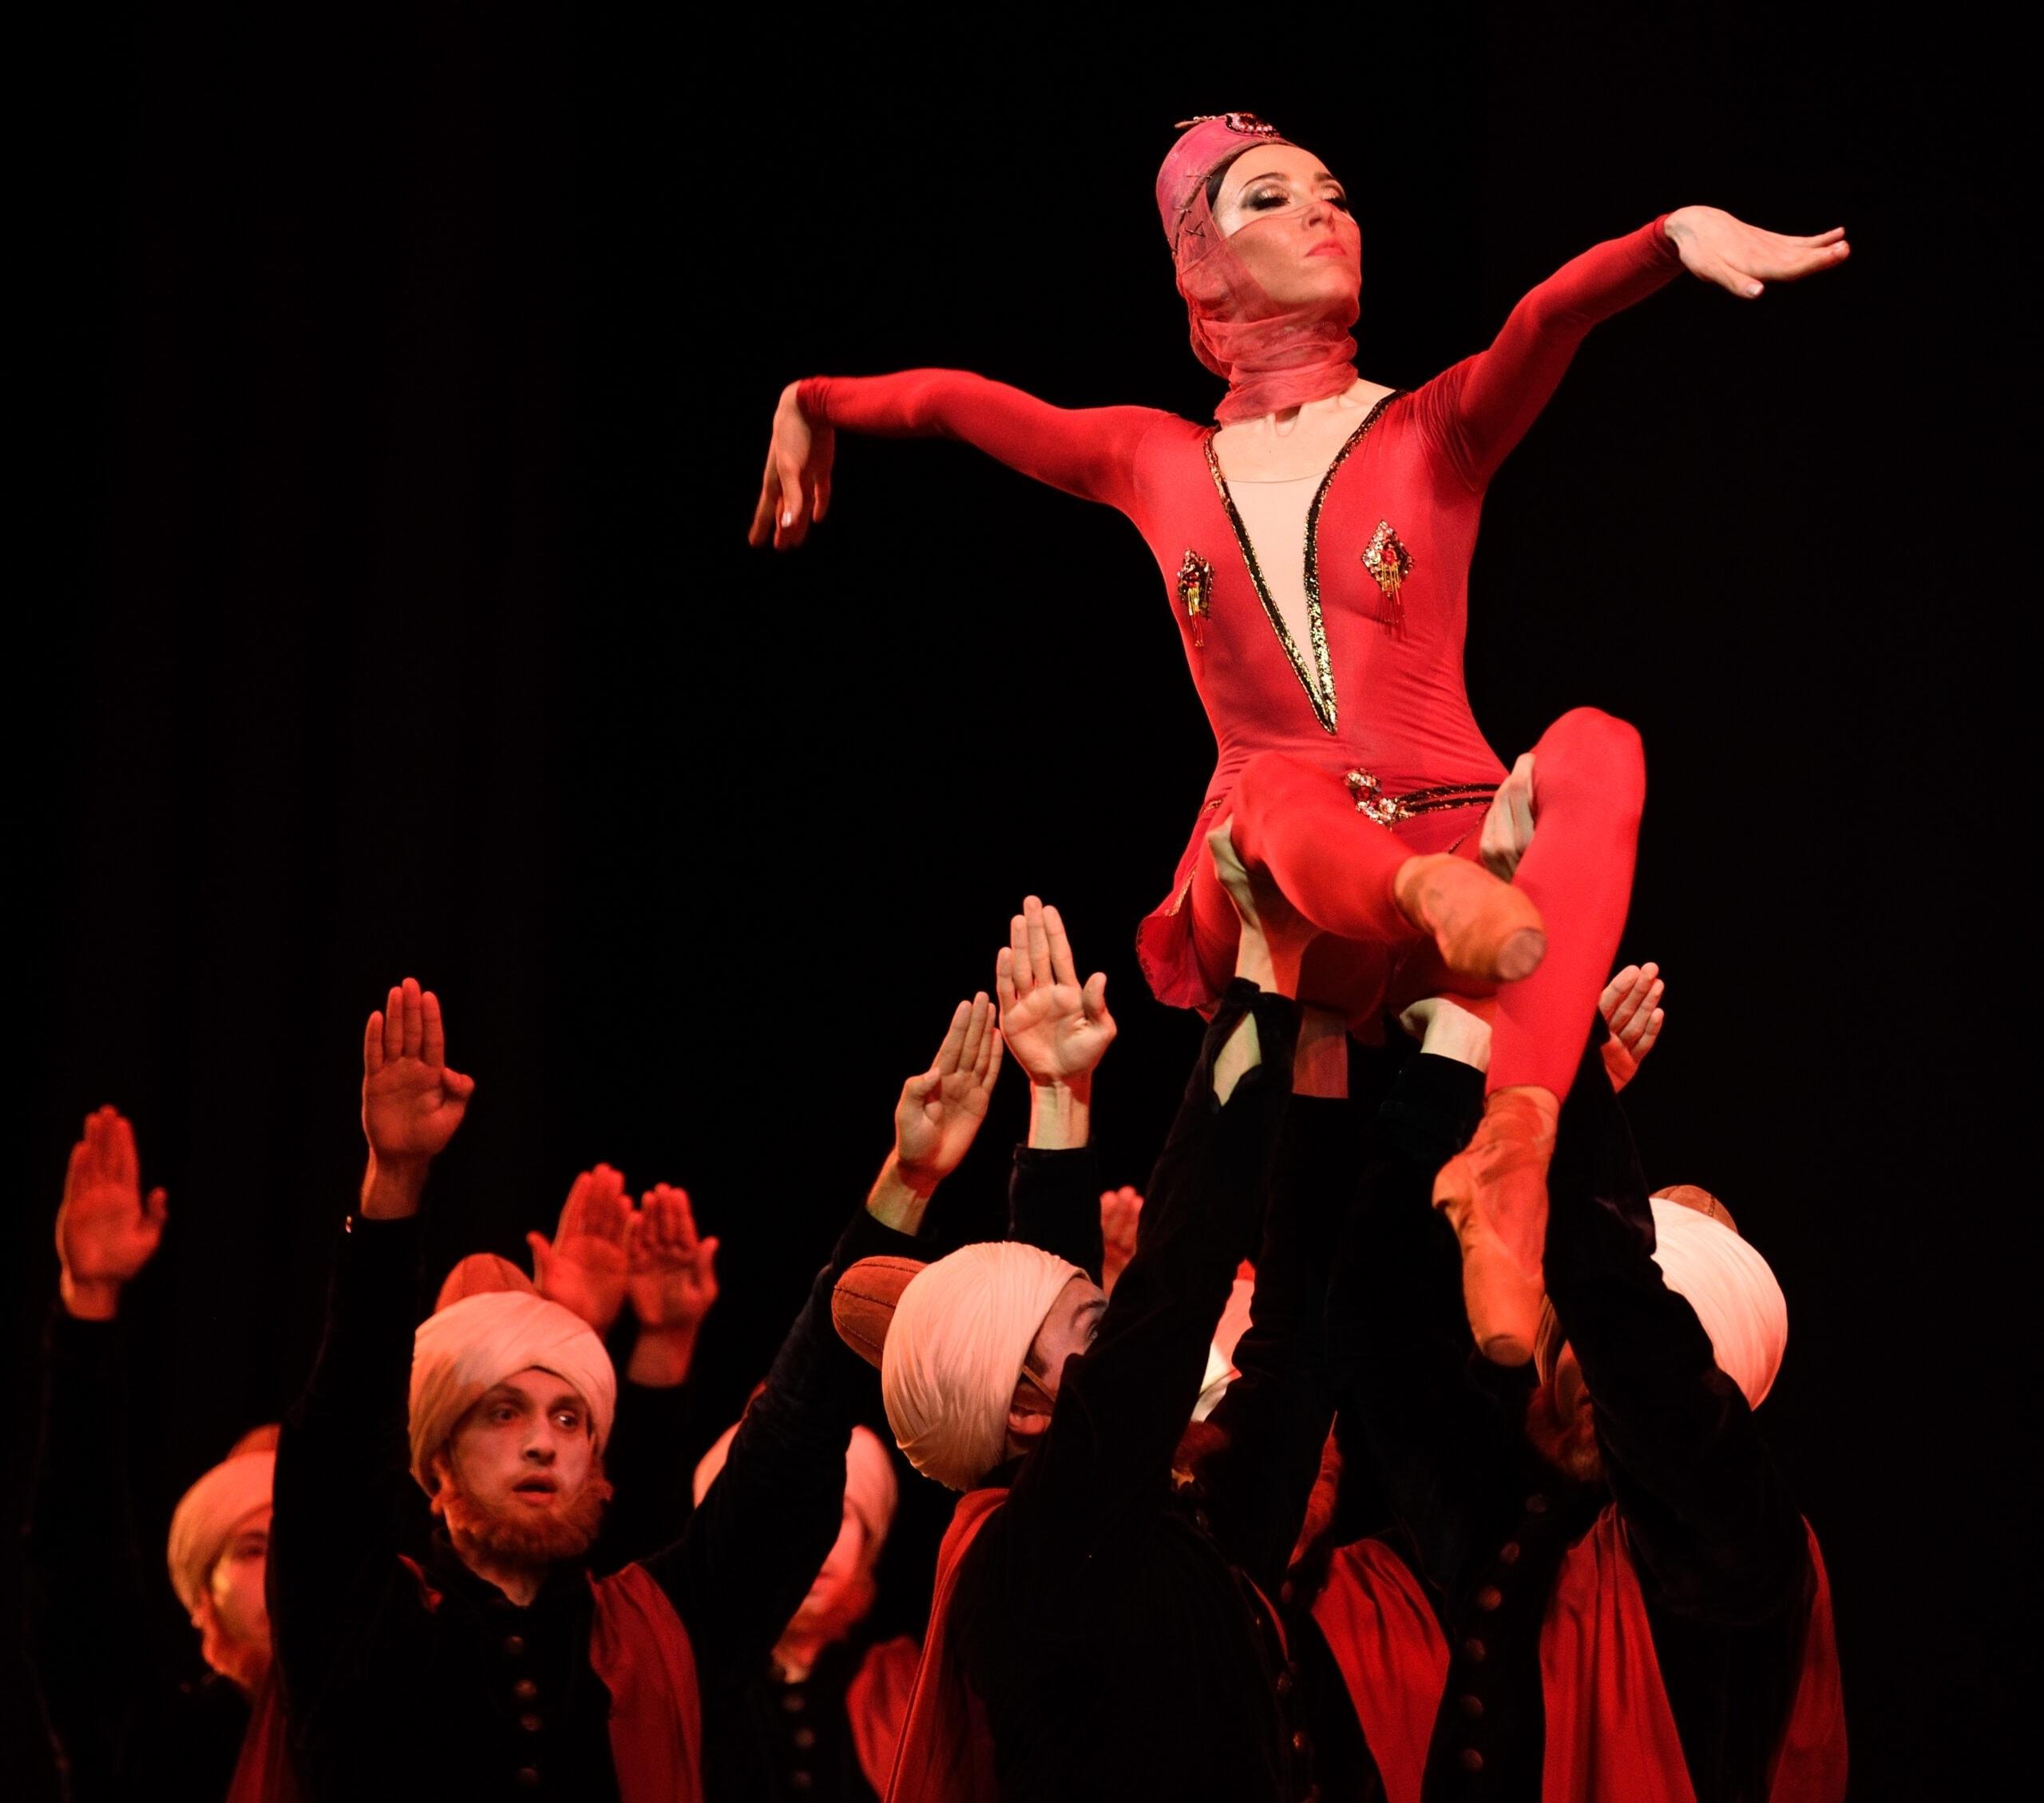 Балет «Легенда о любви» в Мариинском театре. Фото - Ирина Туминене